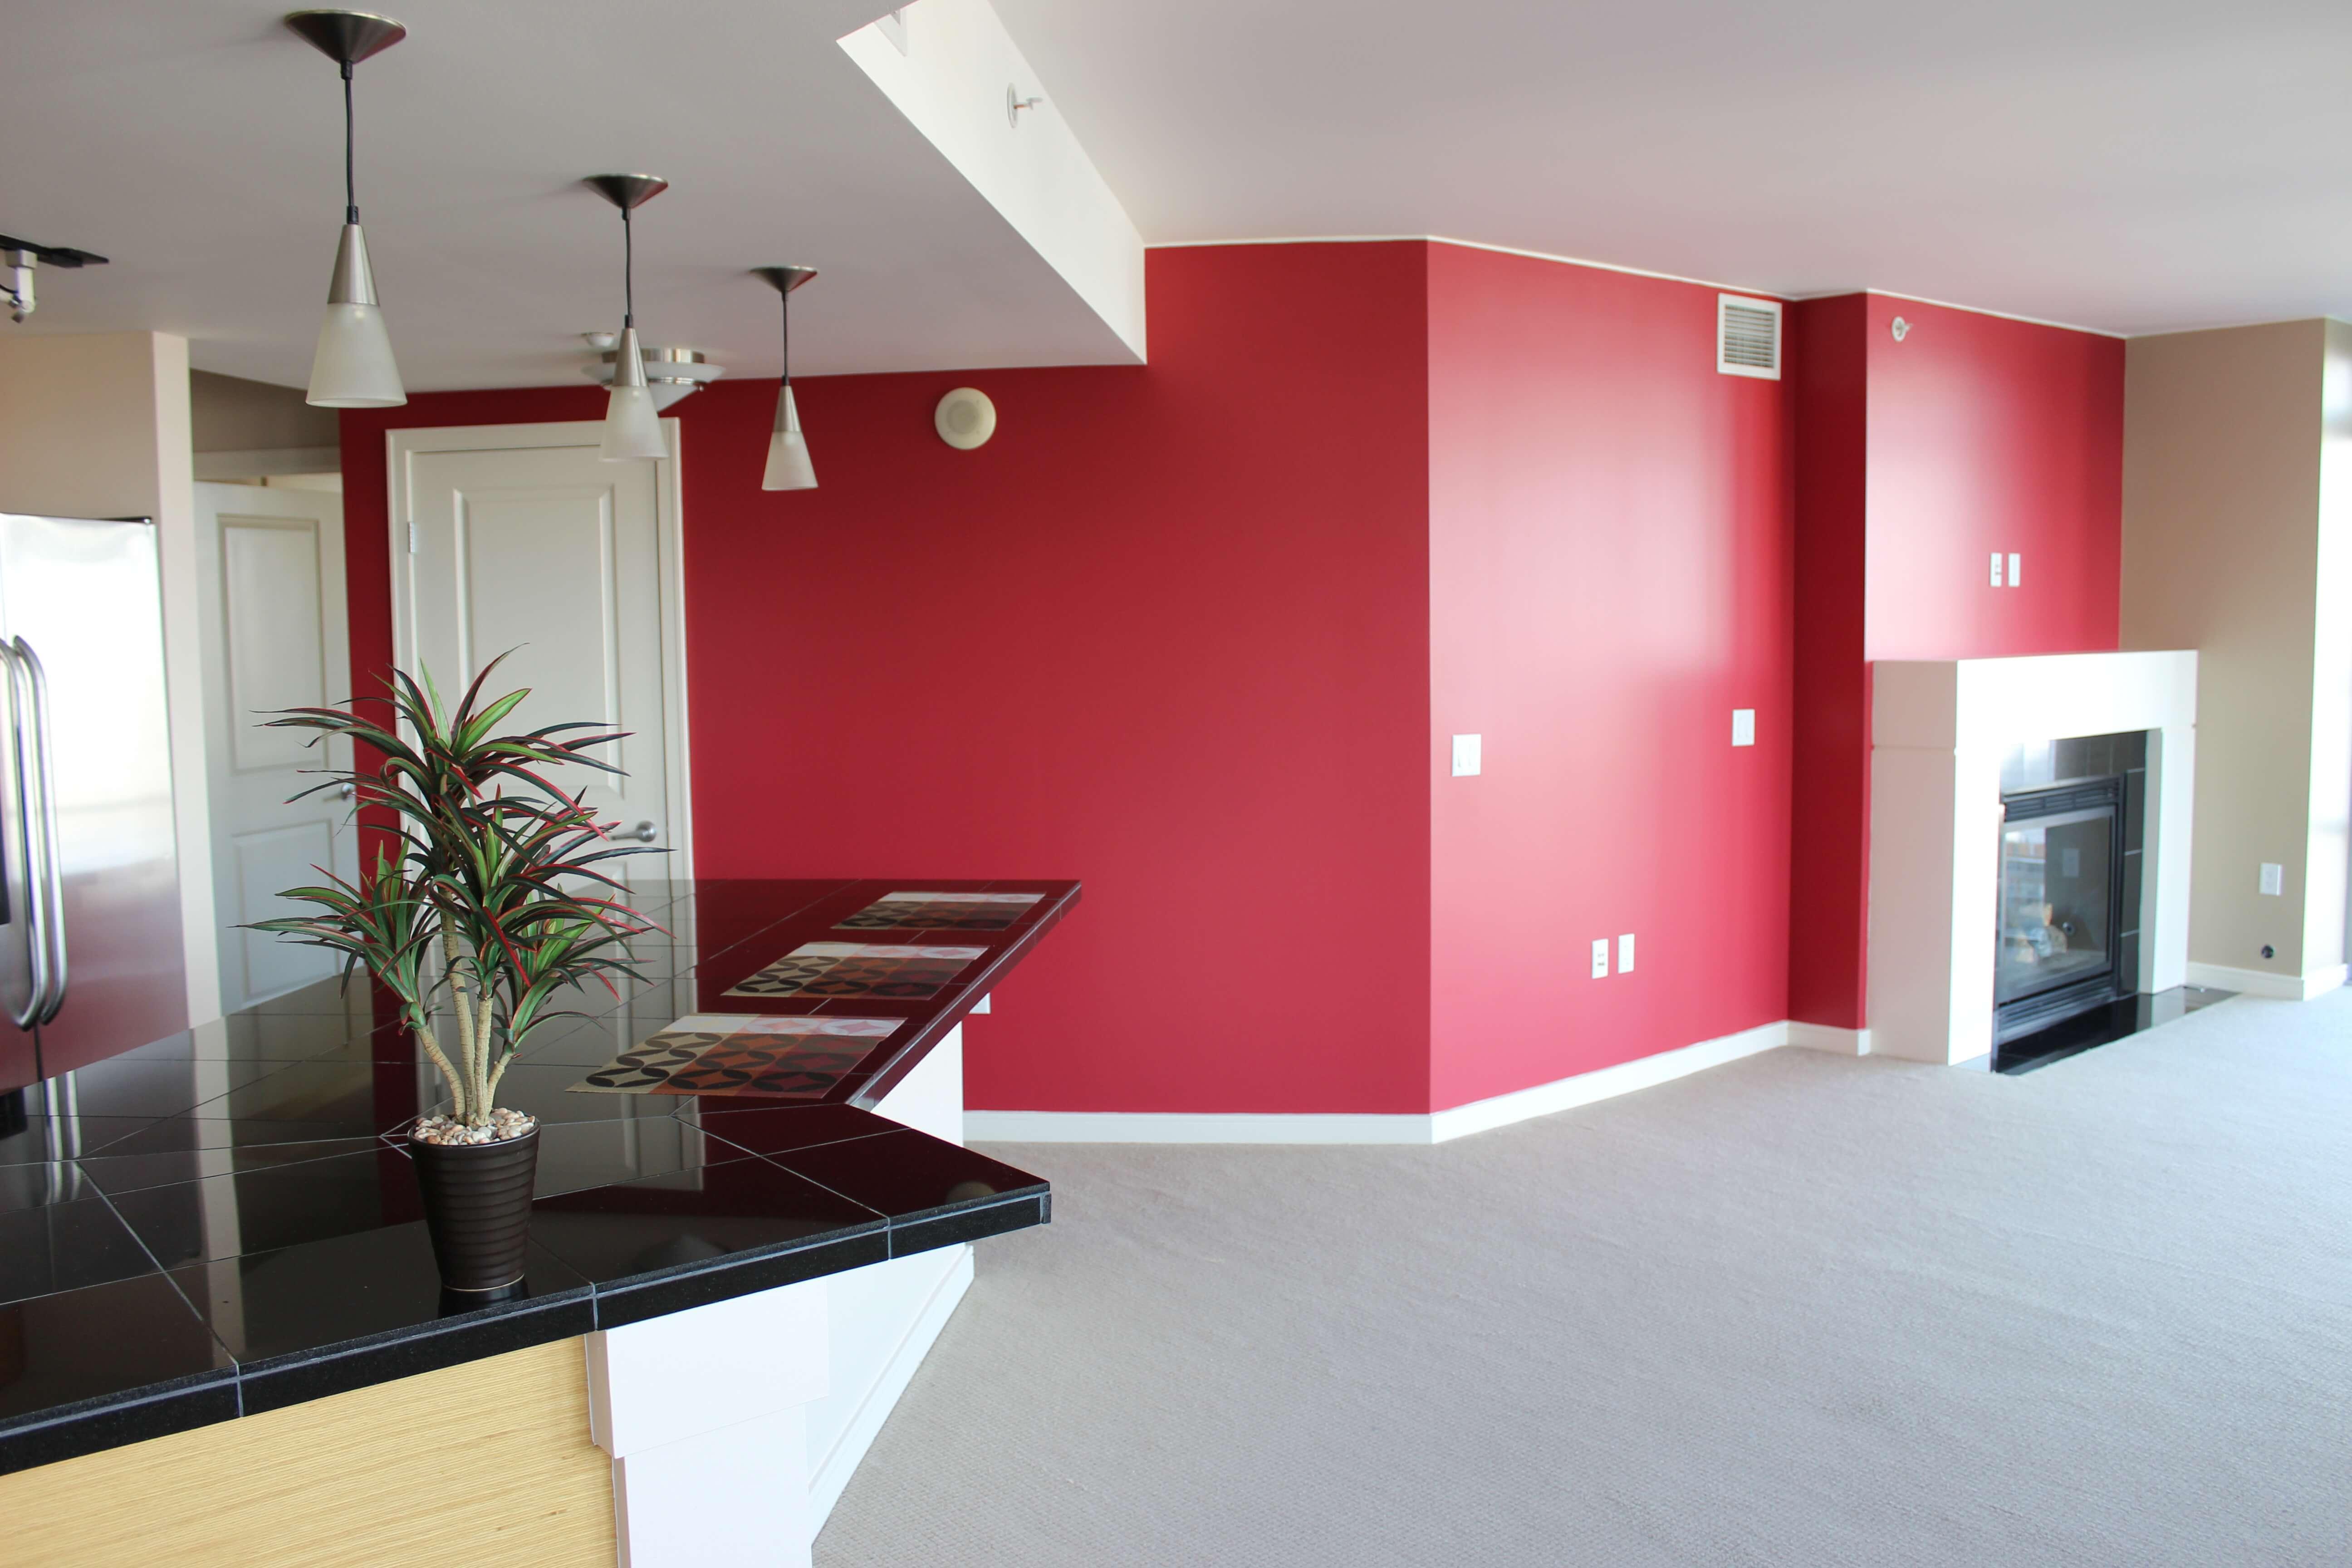 Como elegir el color para pintar mi casa pinturas coche for Como pintar casa interior